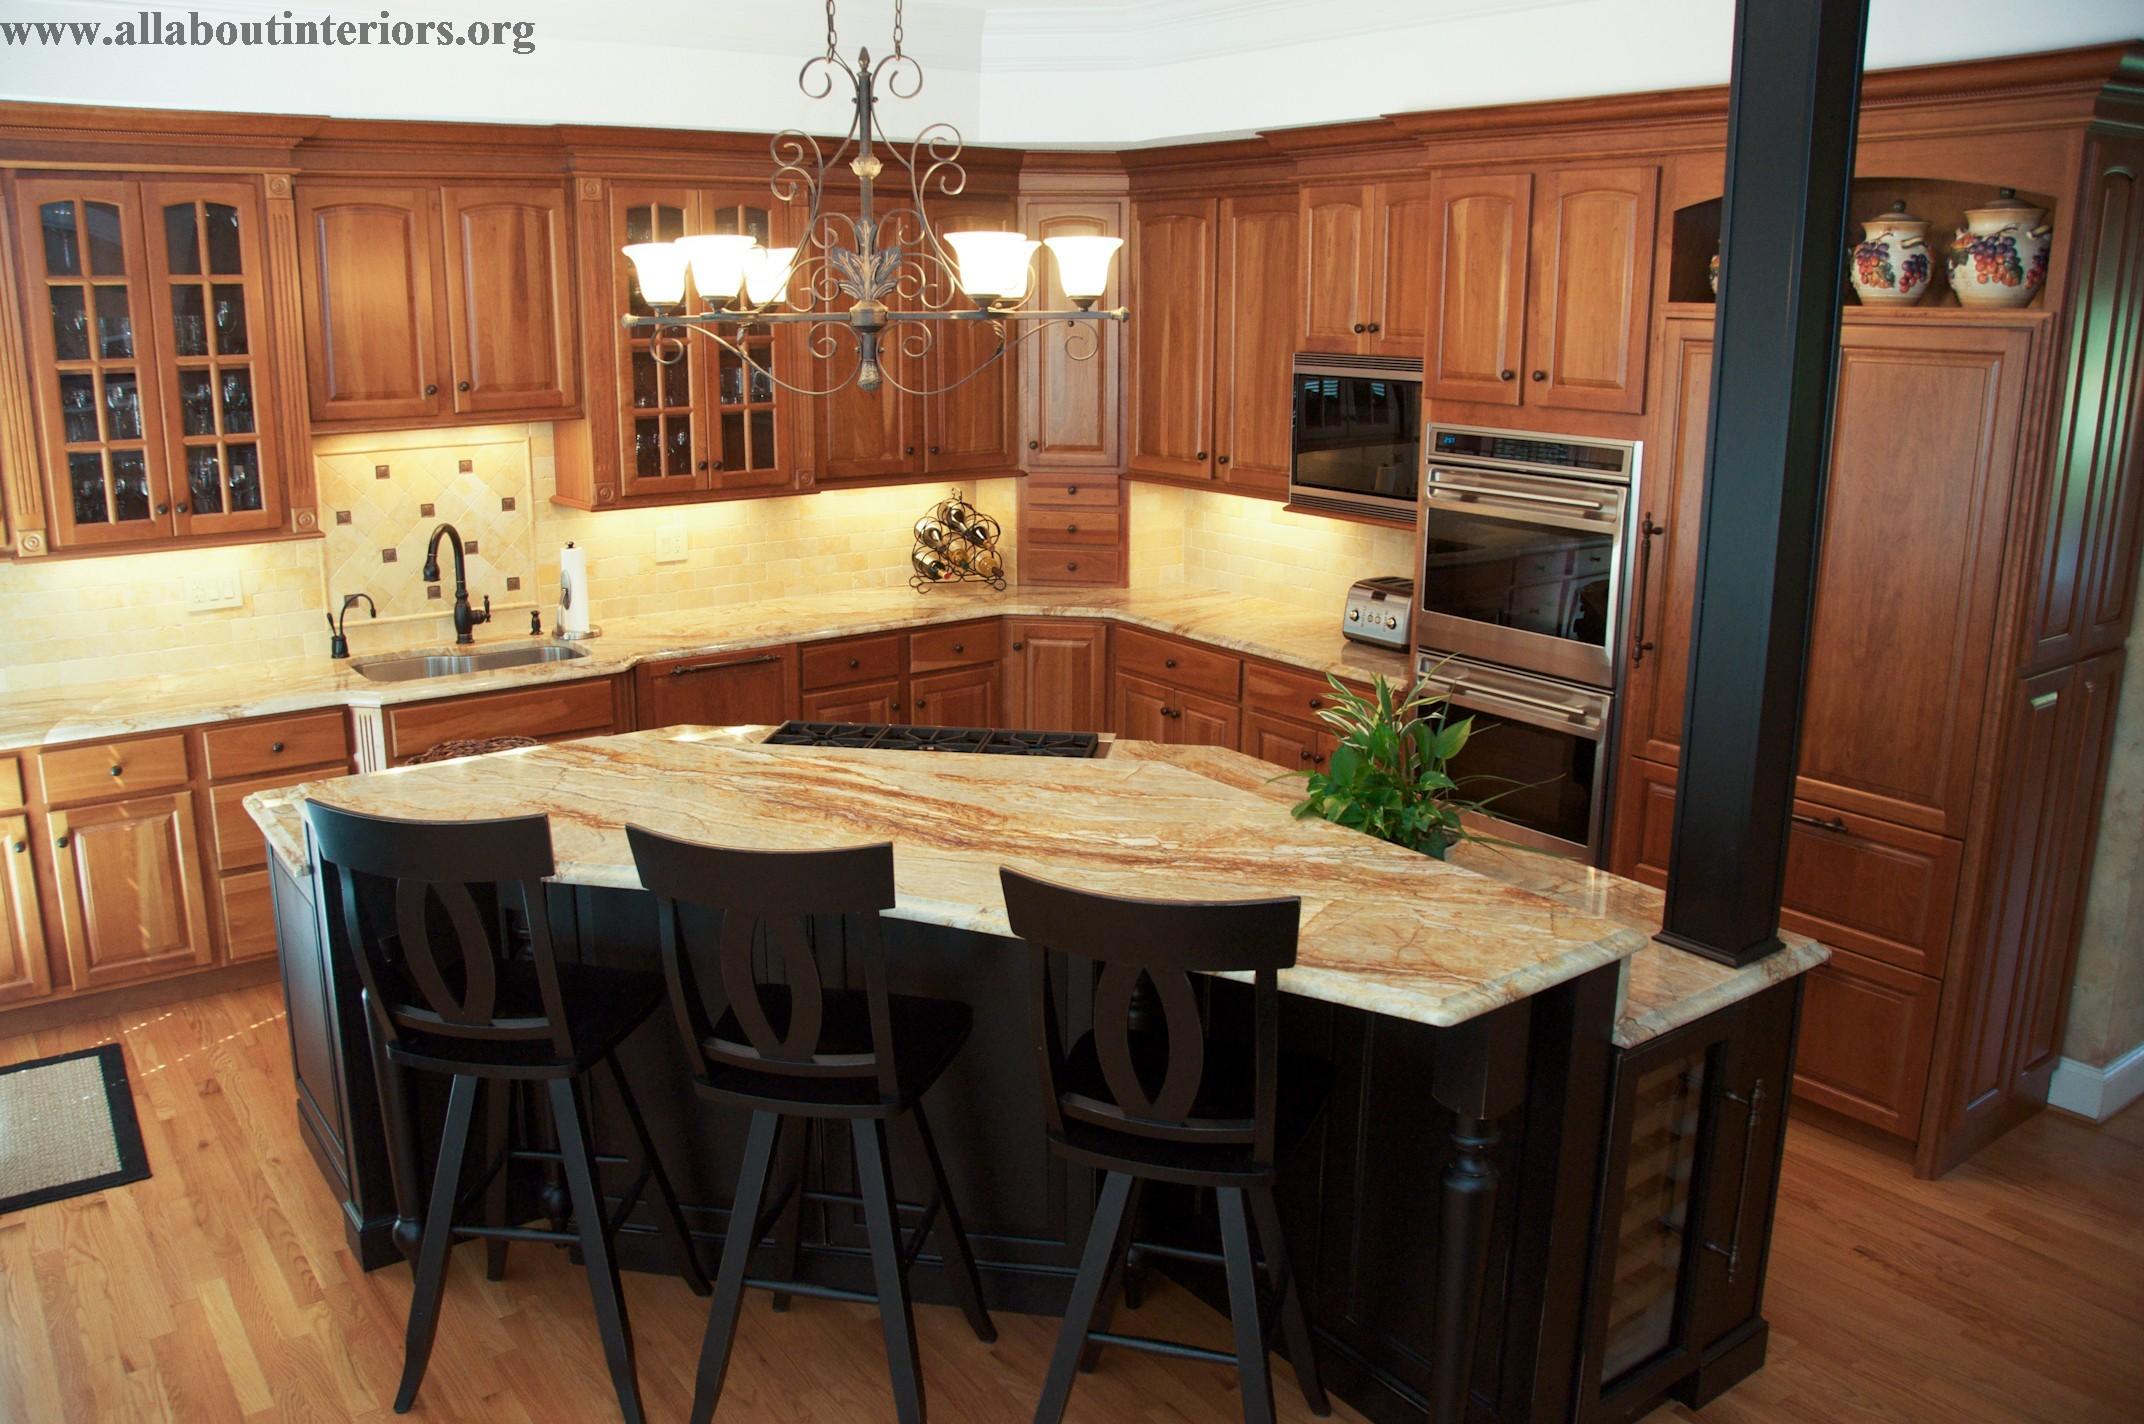 Deluzio Kitchen cabinets